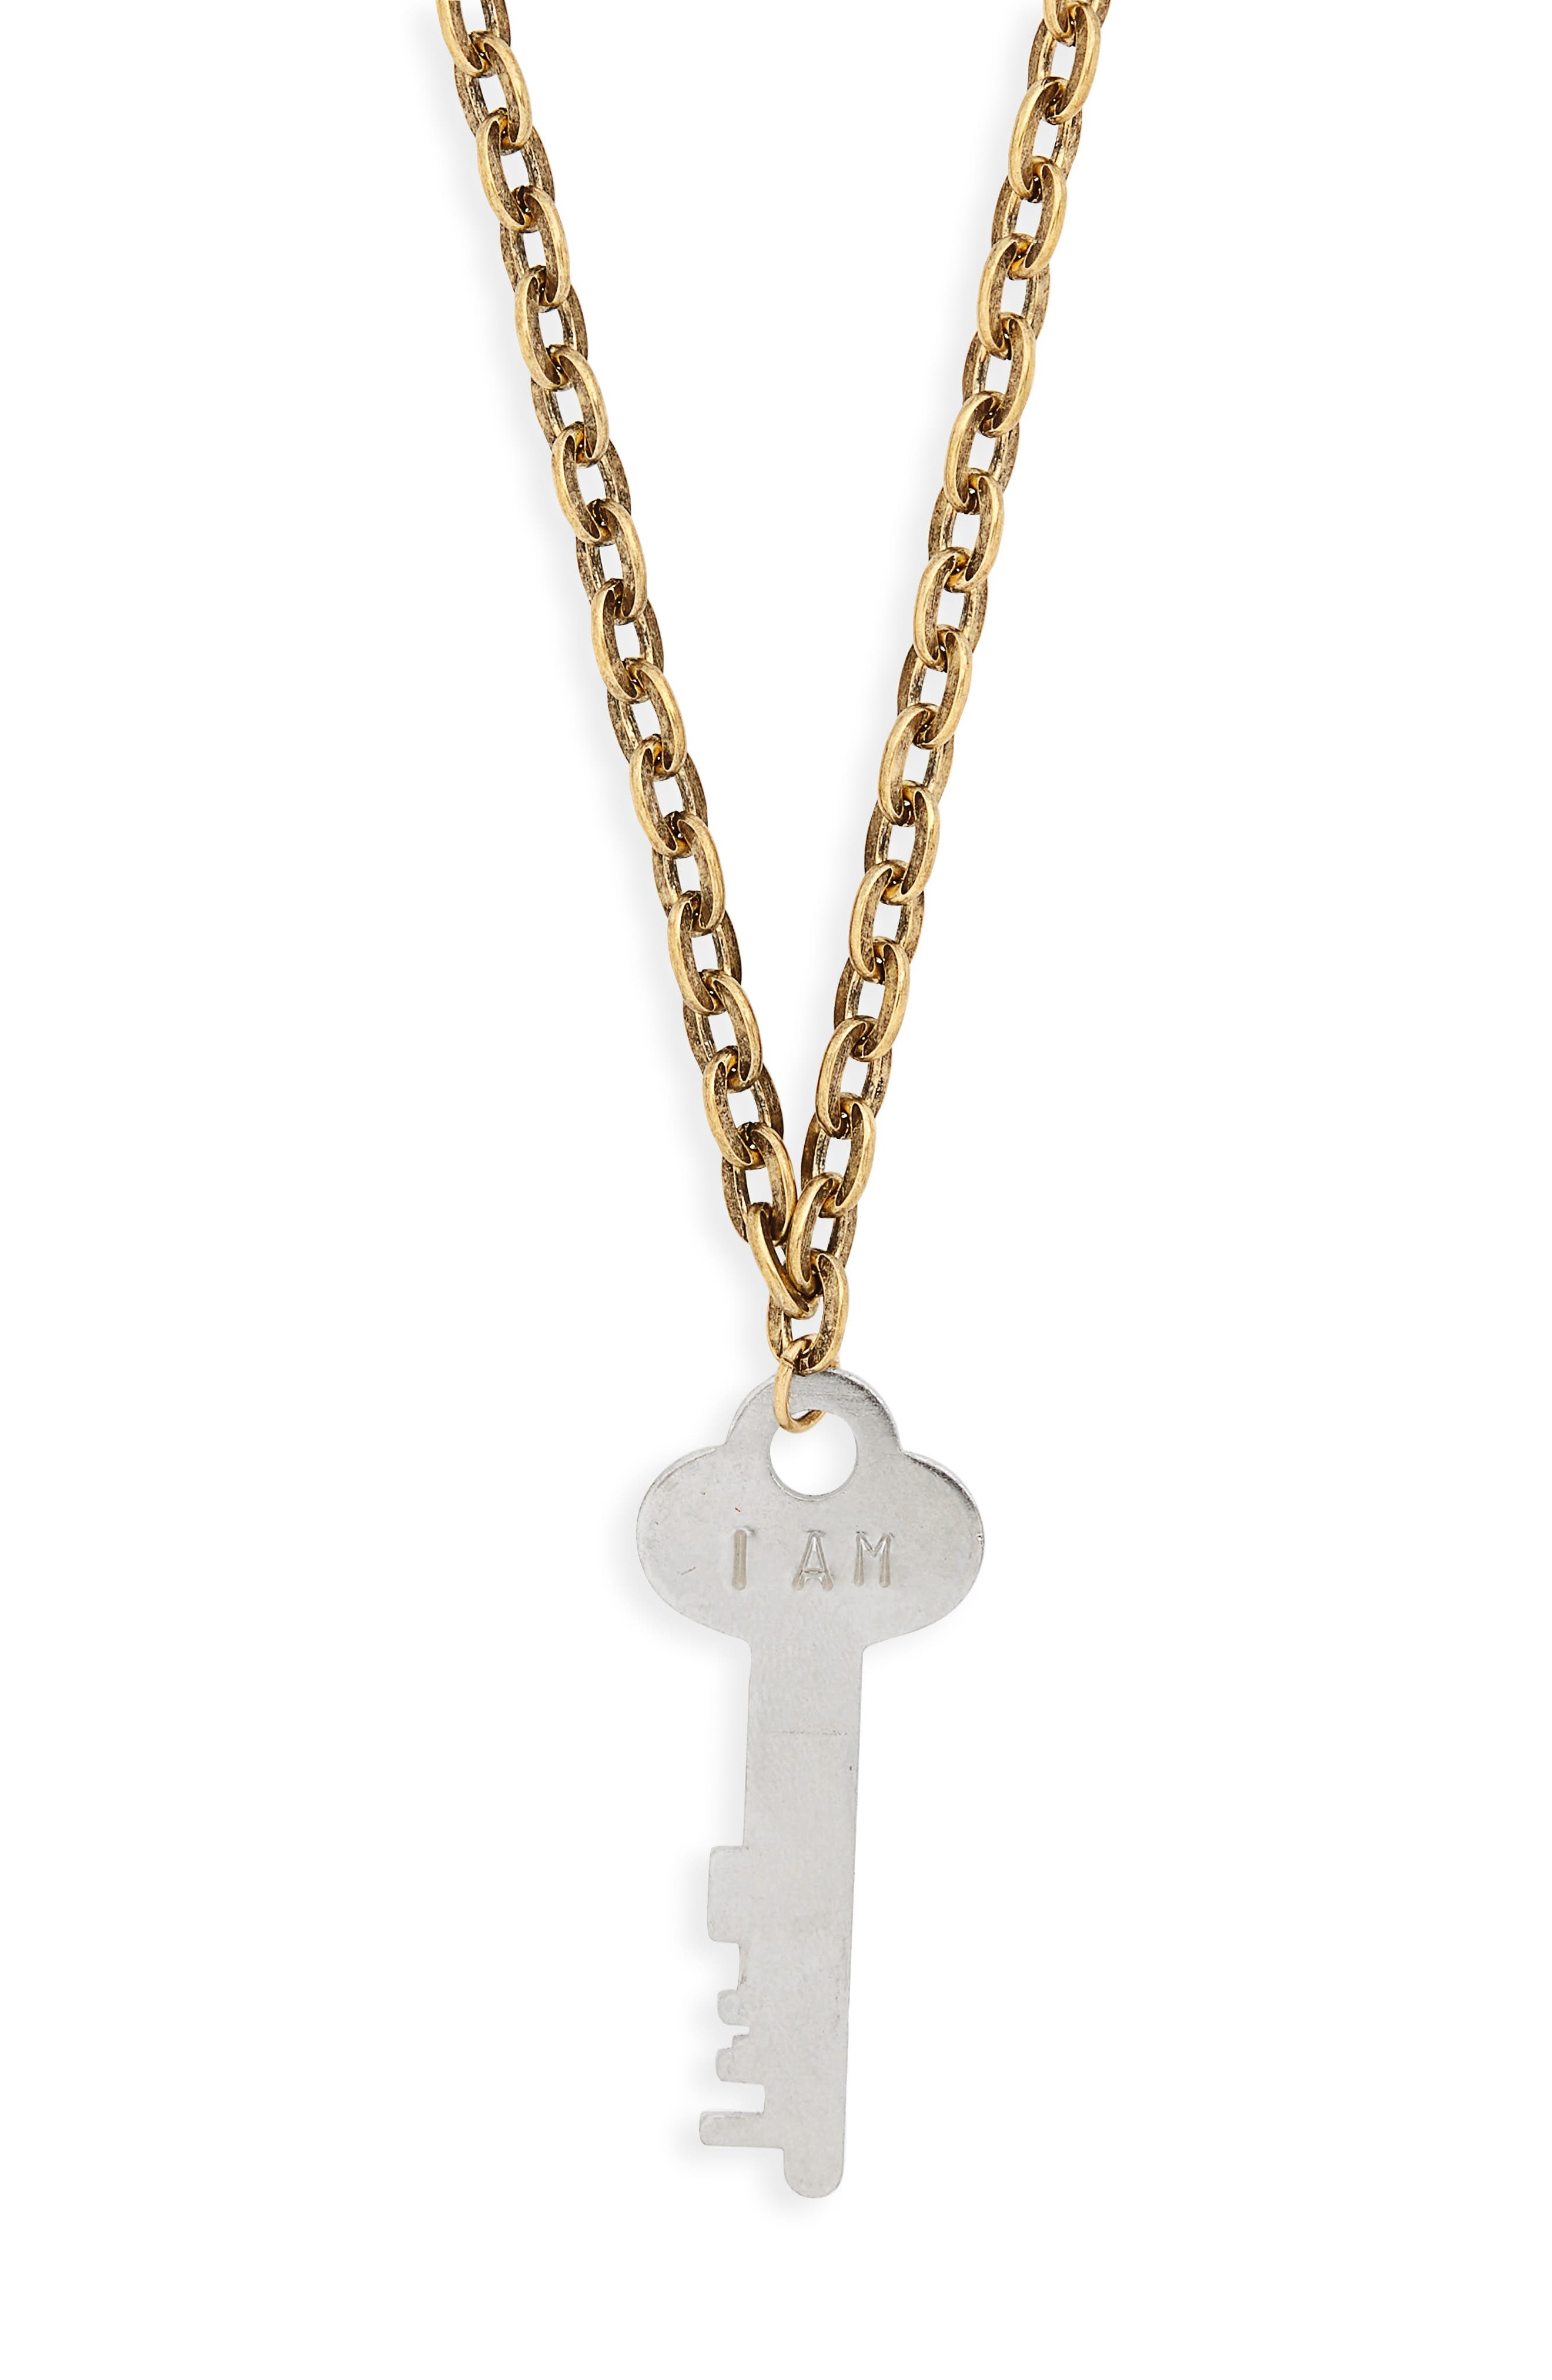 I Am Grateful Key Charm Necklace,                             Alternate thumbnail 2, color,                             Gold/ Silver Key